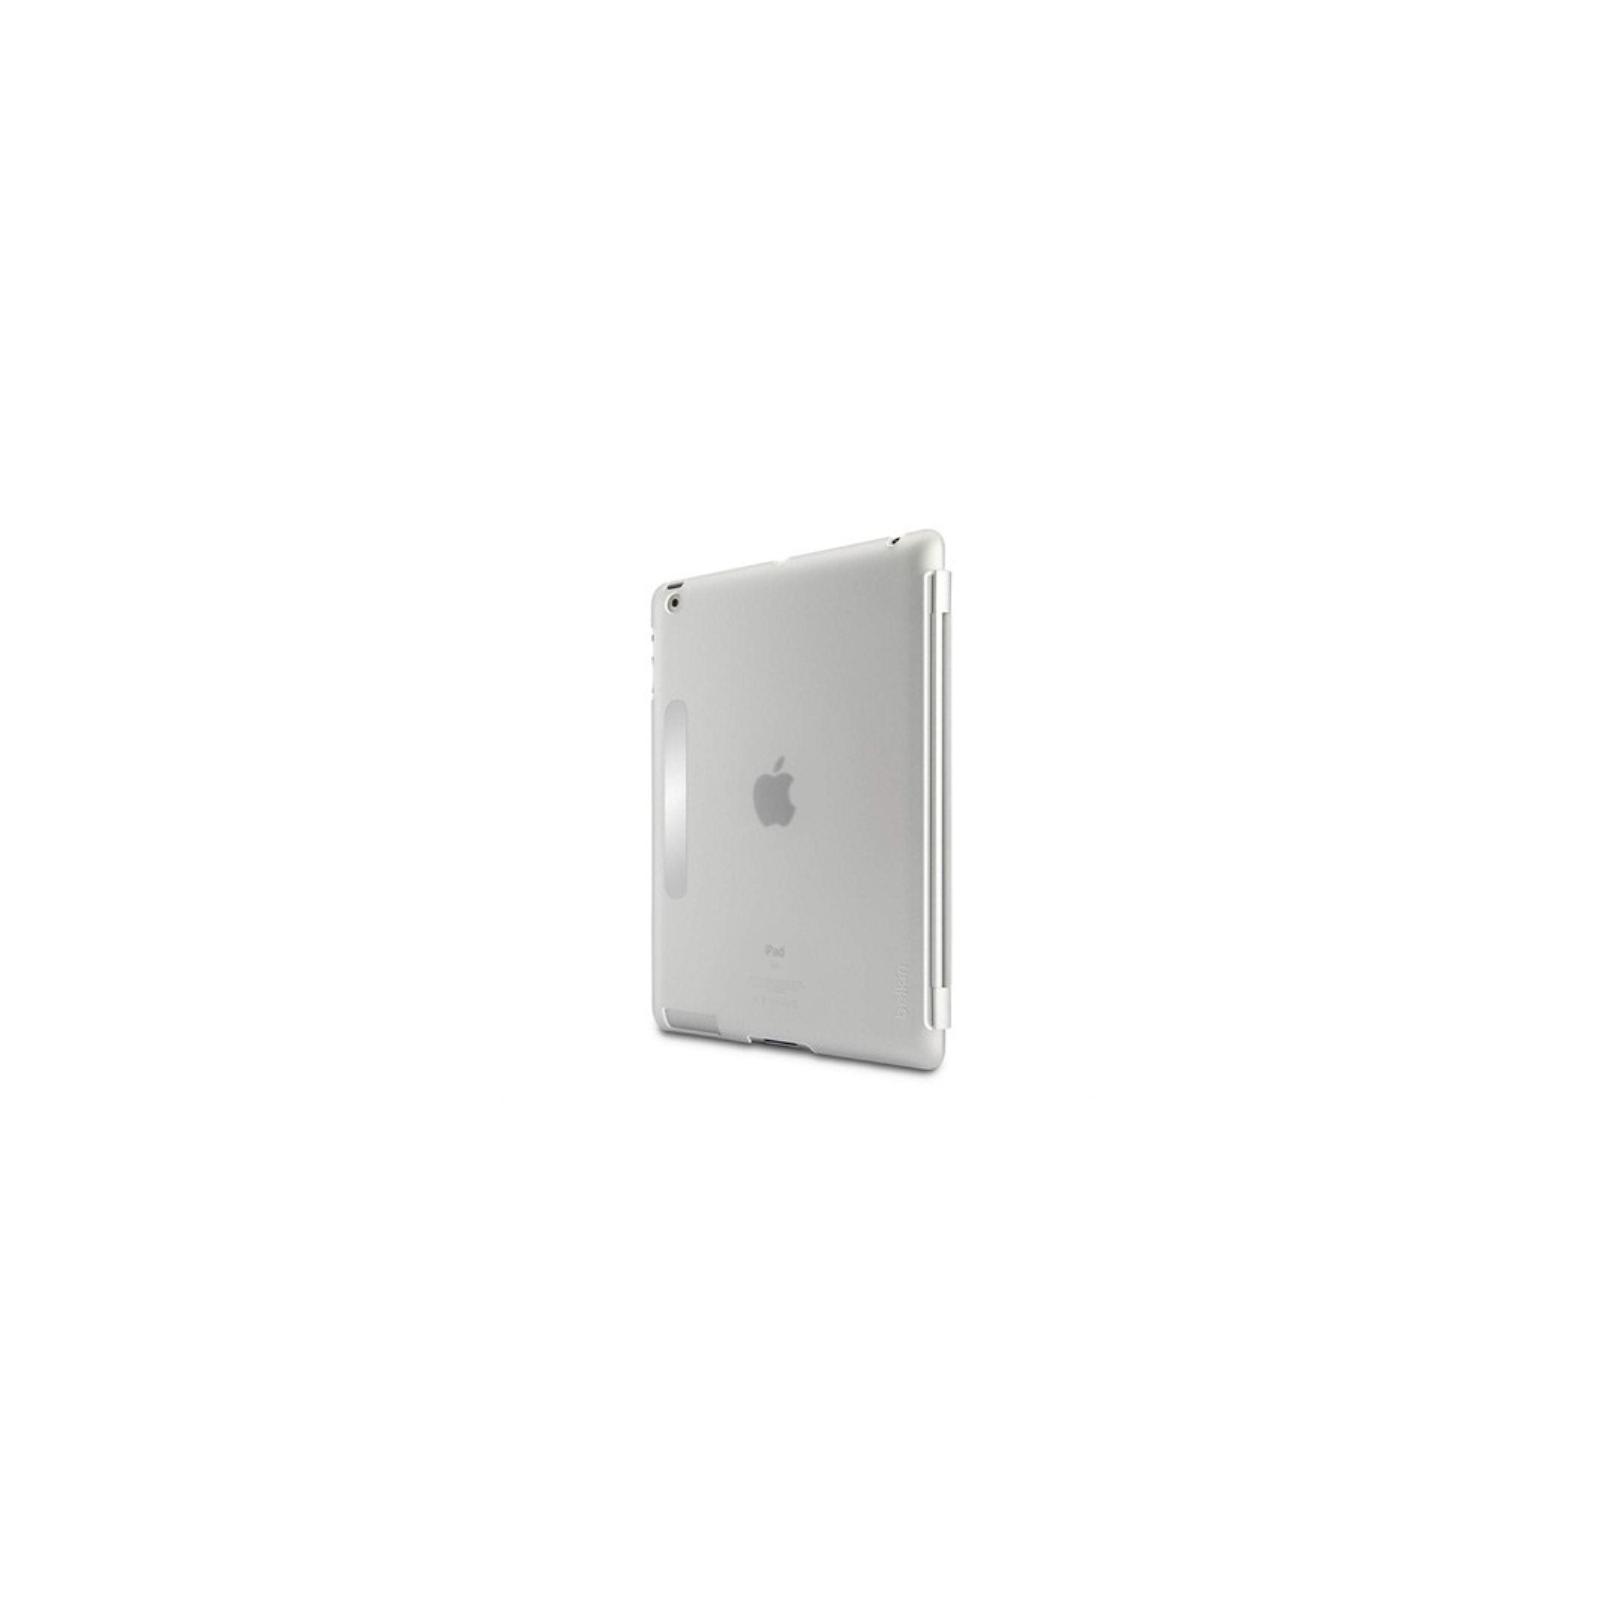 Чехол для планшета Belkin iPad2, iPad3, iPad4 Snap Shield Secure (Clear) (F8N745cwC01)